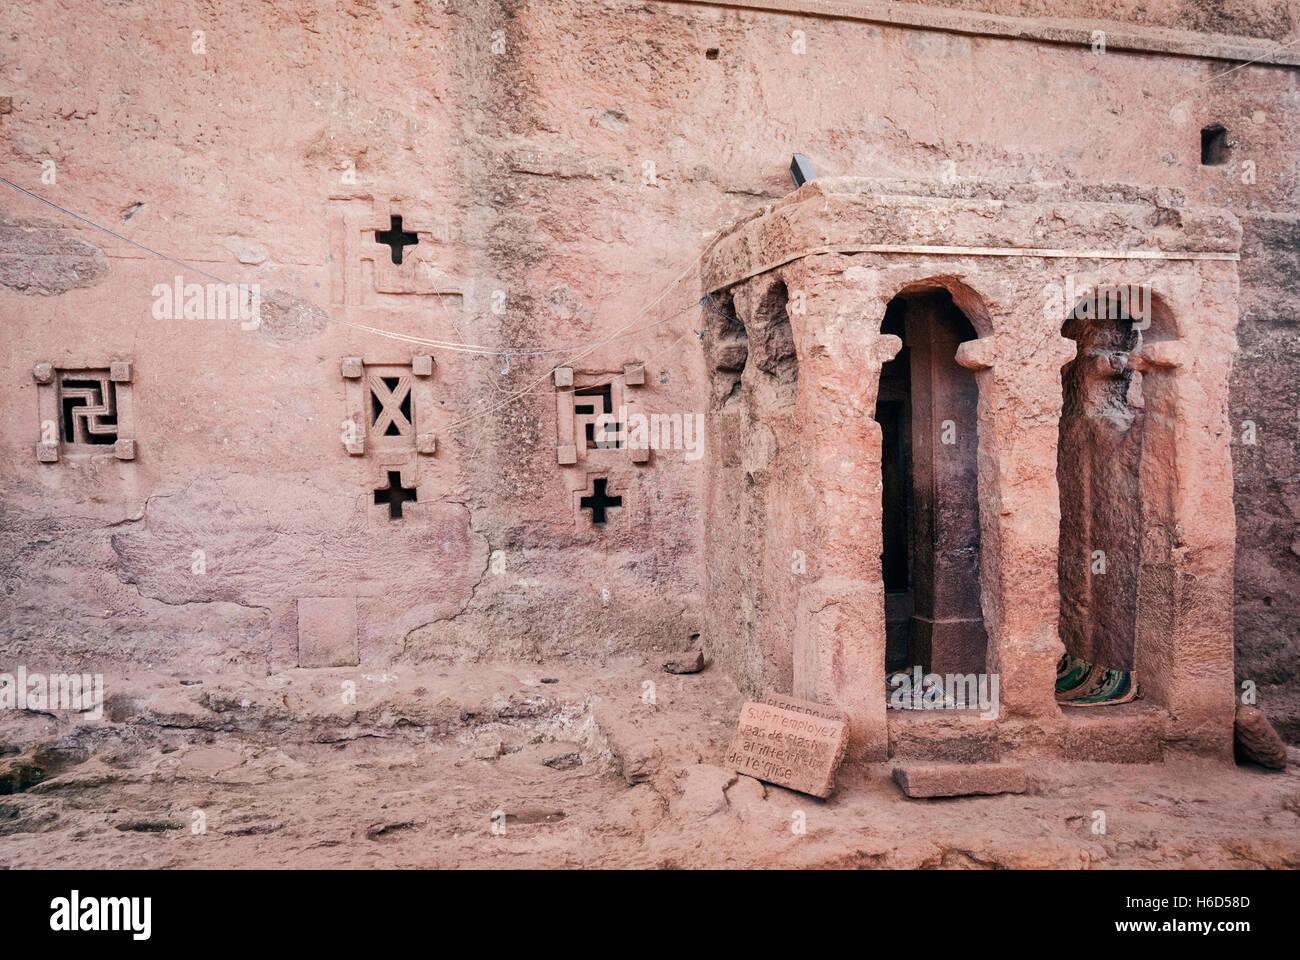 famous ancient ethiopian orthodox christian rock hewn churches of lalibela ethiopia - Stock Image